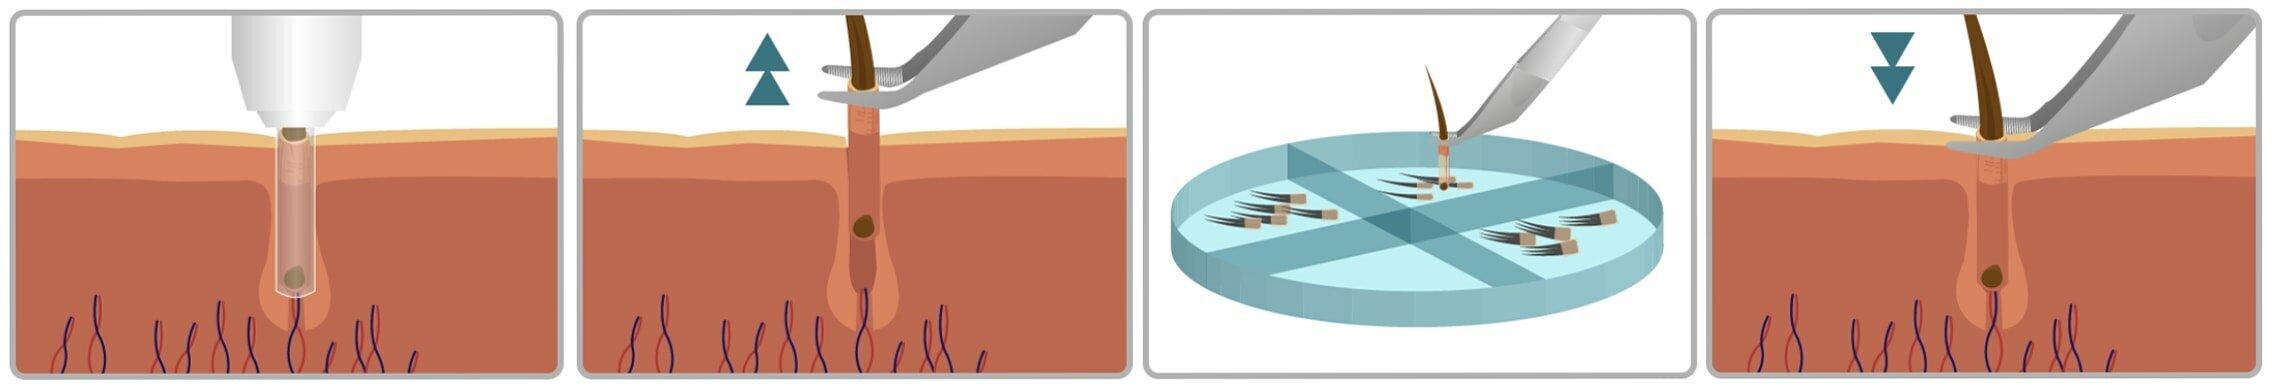 Follicular Unit Extraction